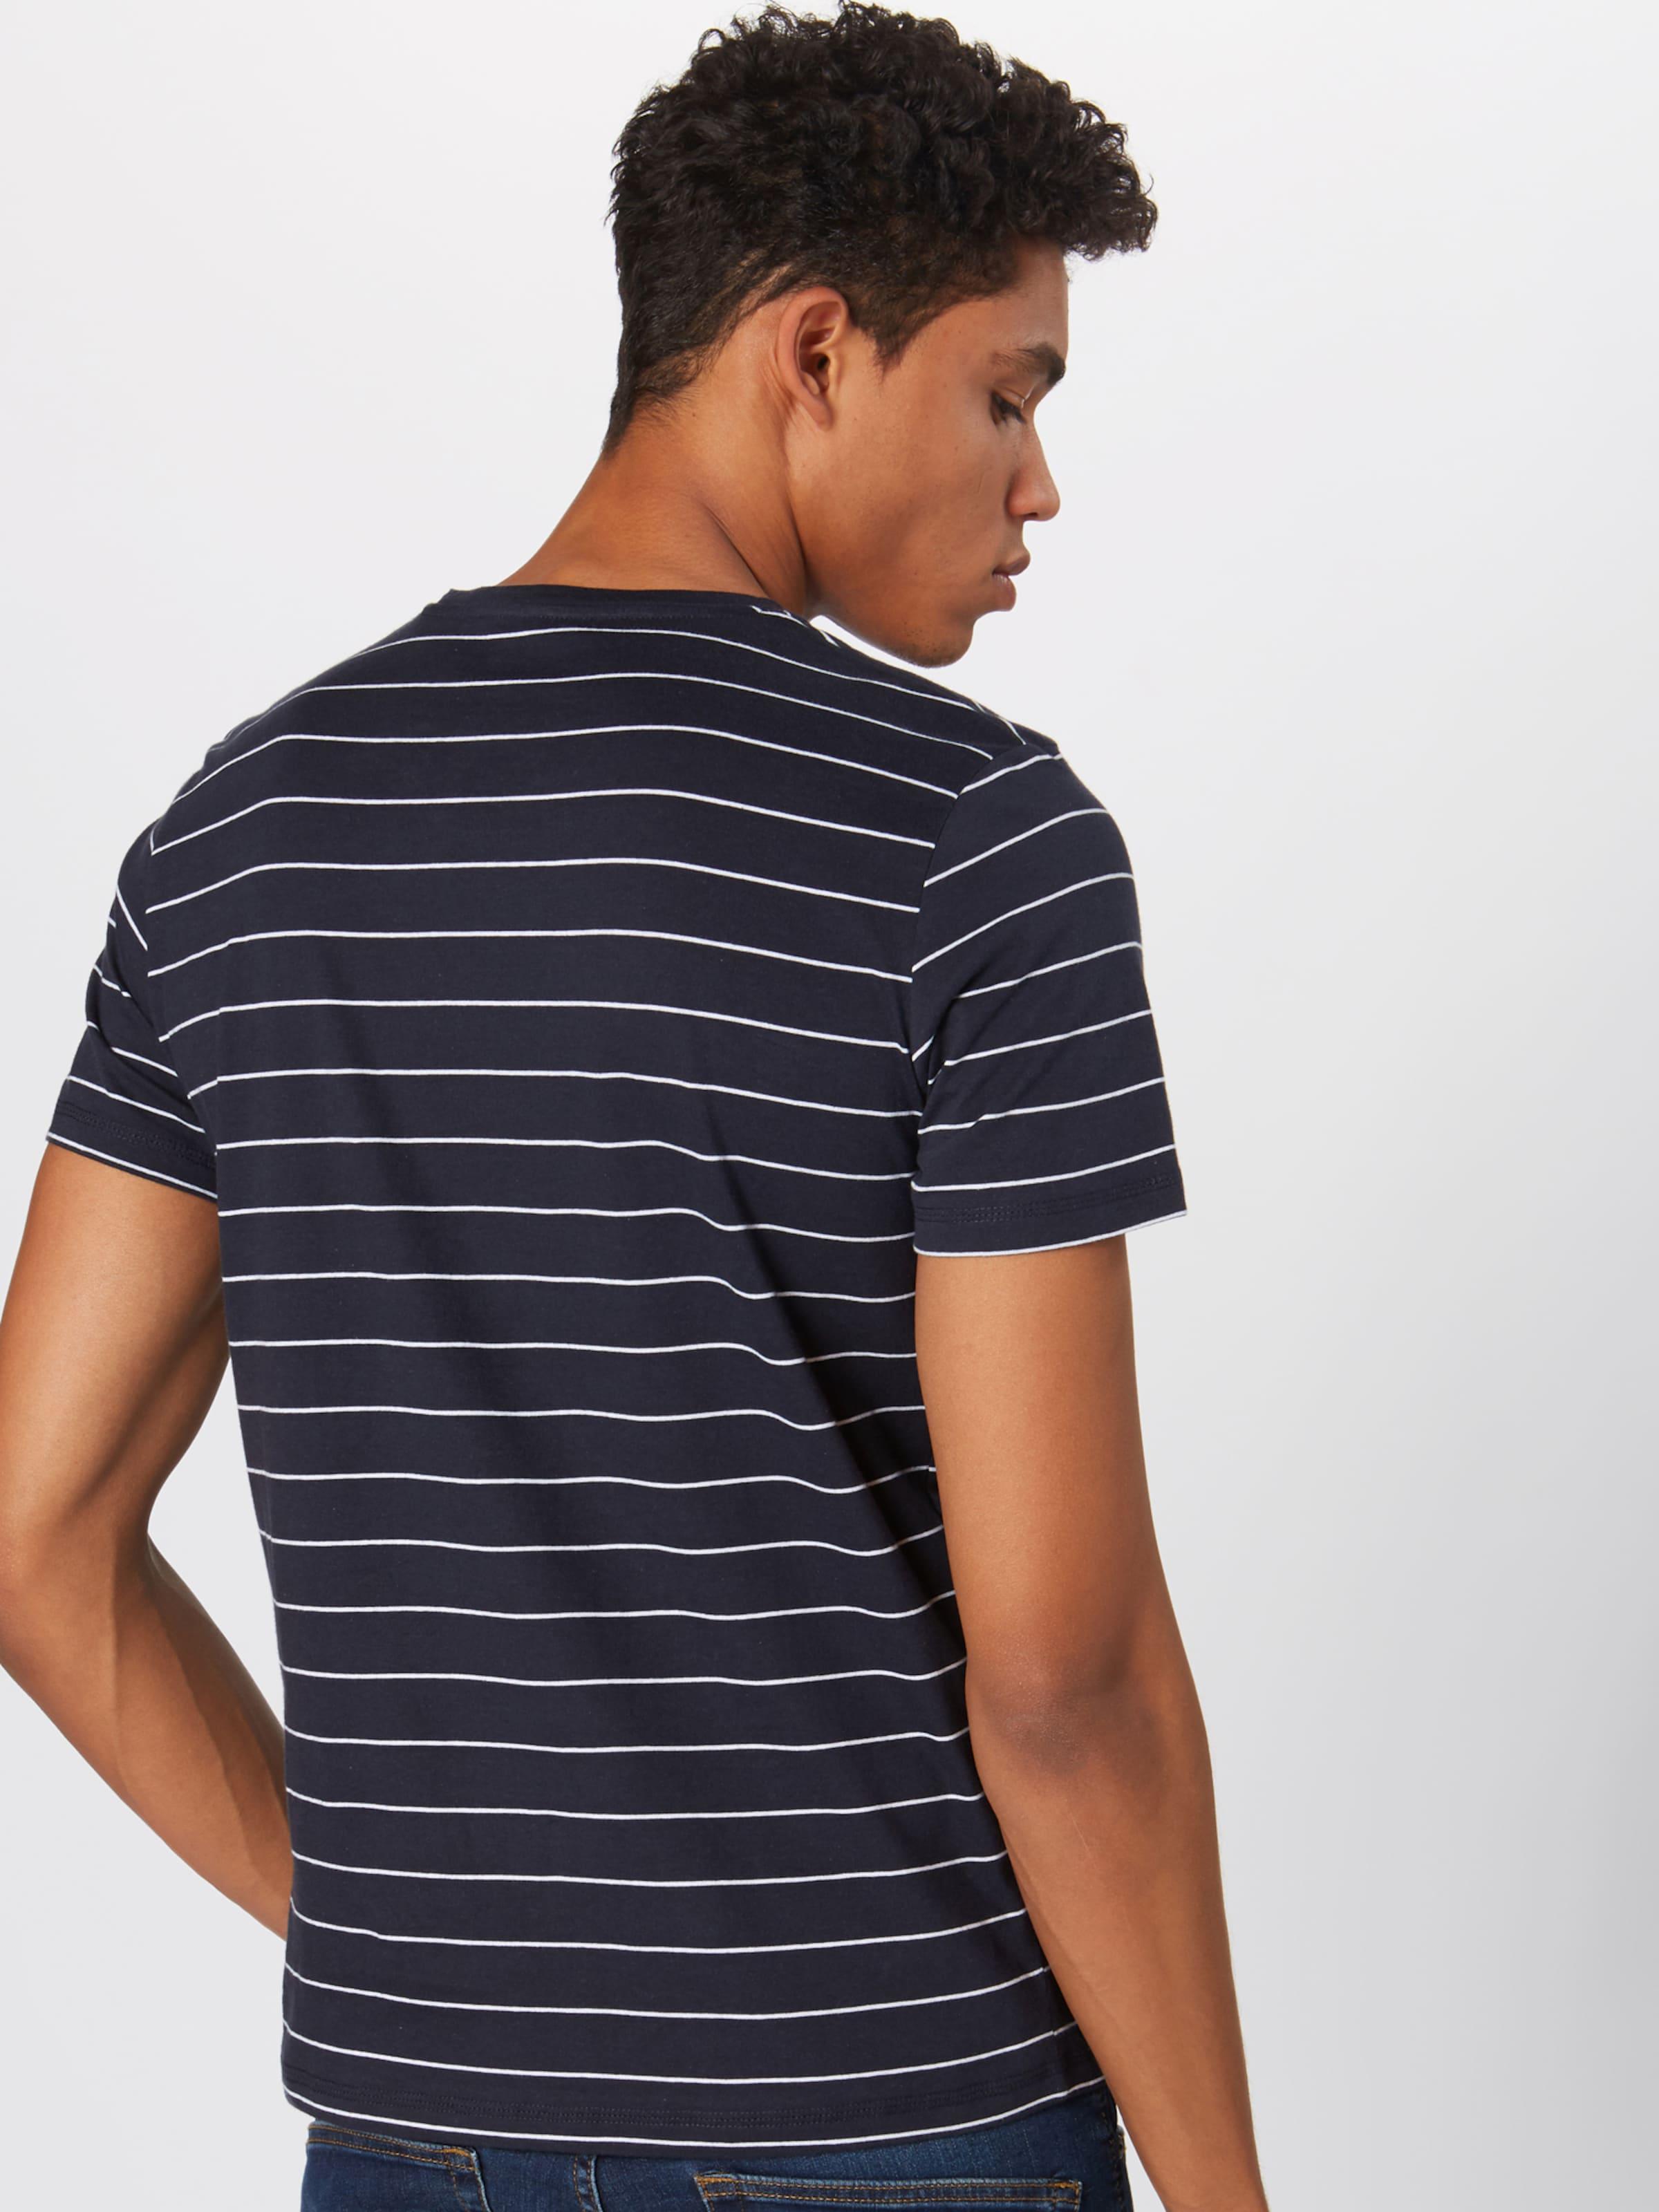 Tee HerrenShirtsamp; 'striped Polos 2' shirt Tom In Tailor NavyGrau T 1 bIYfy7v6g